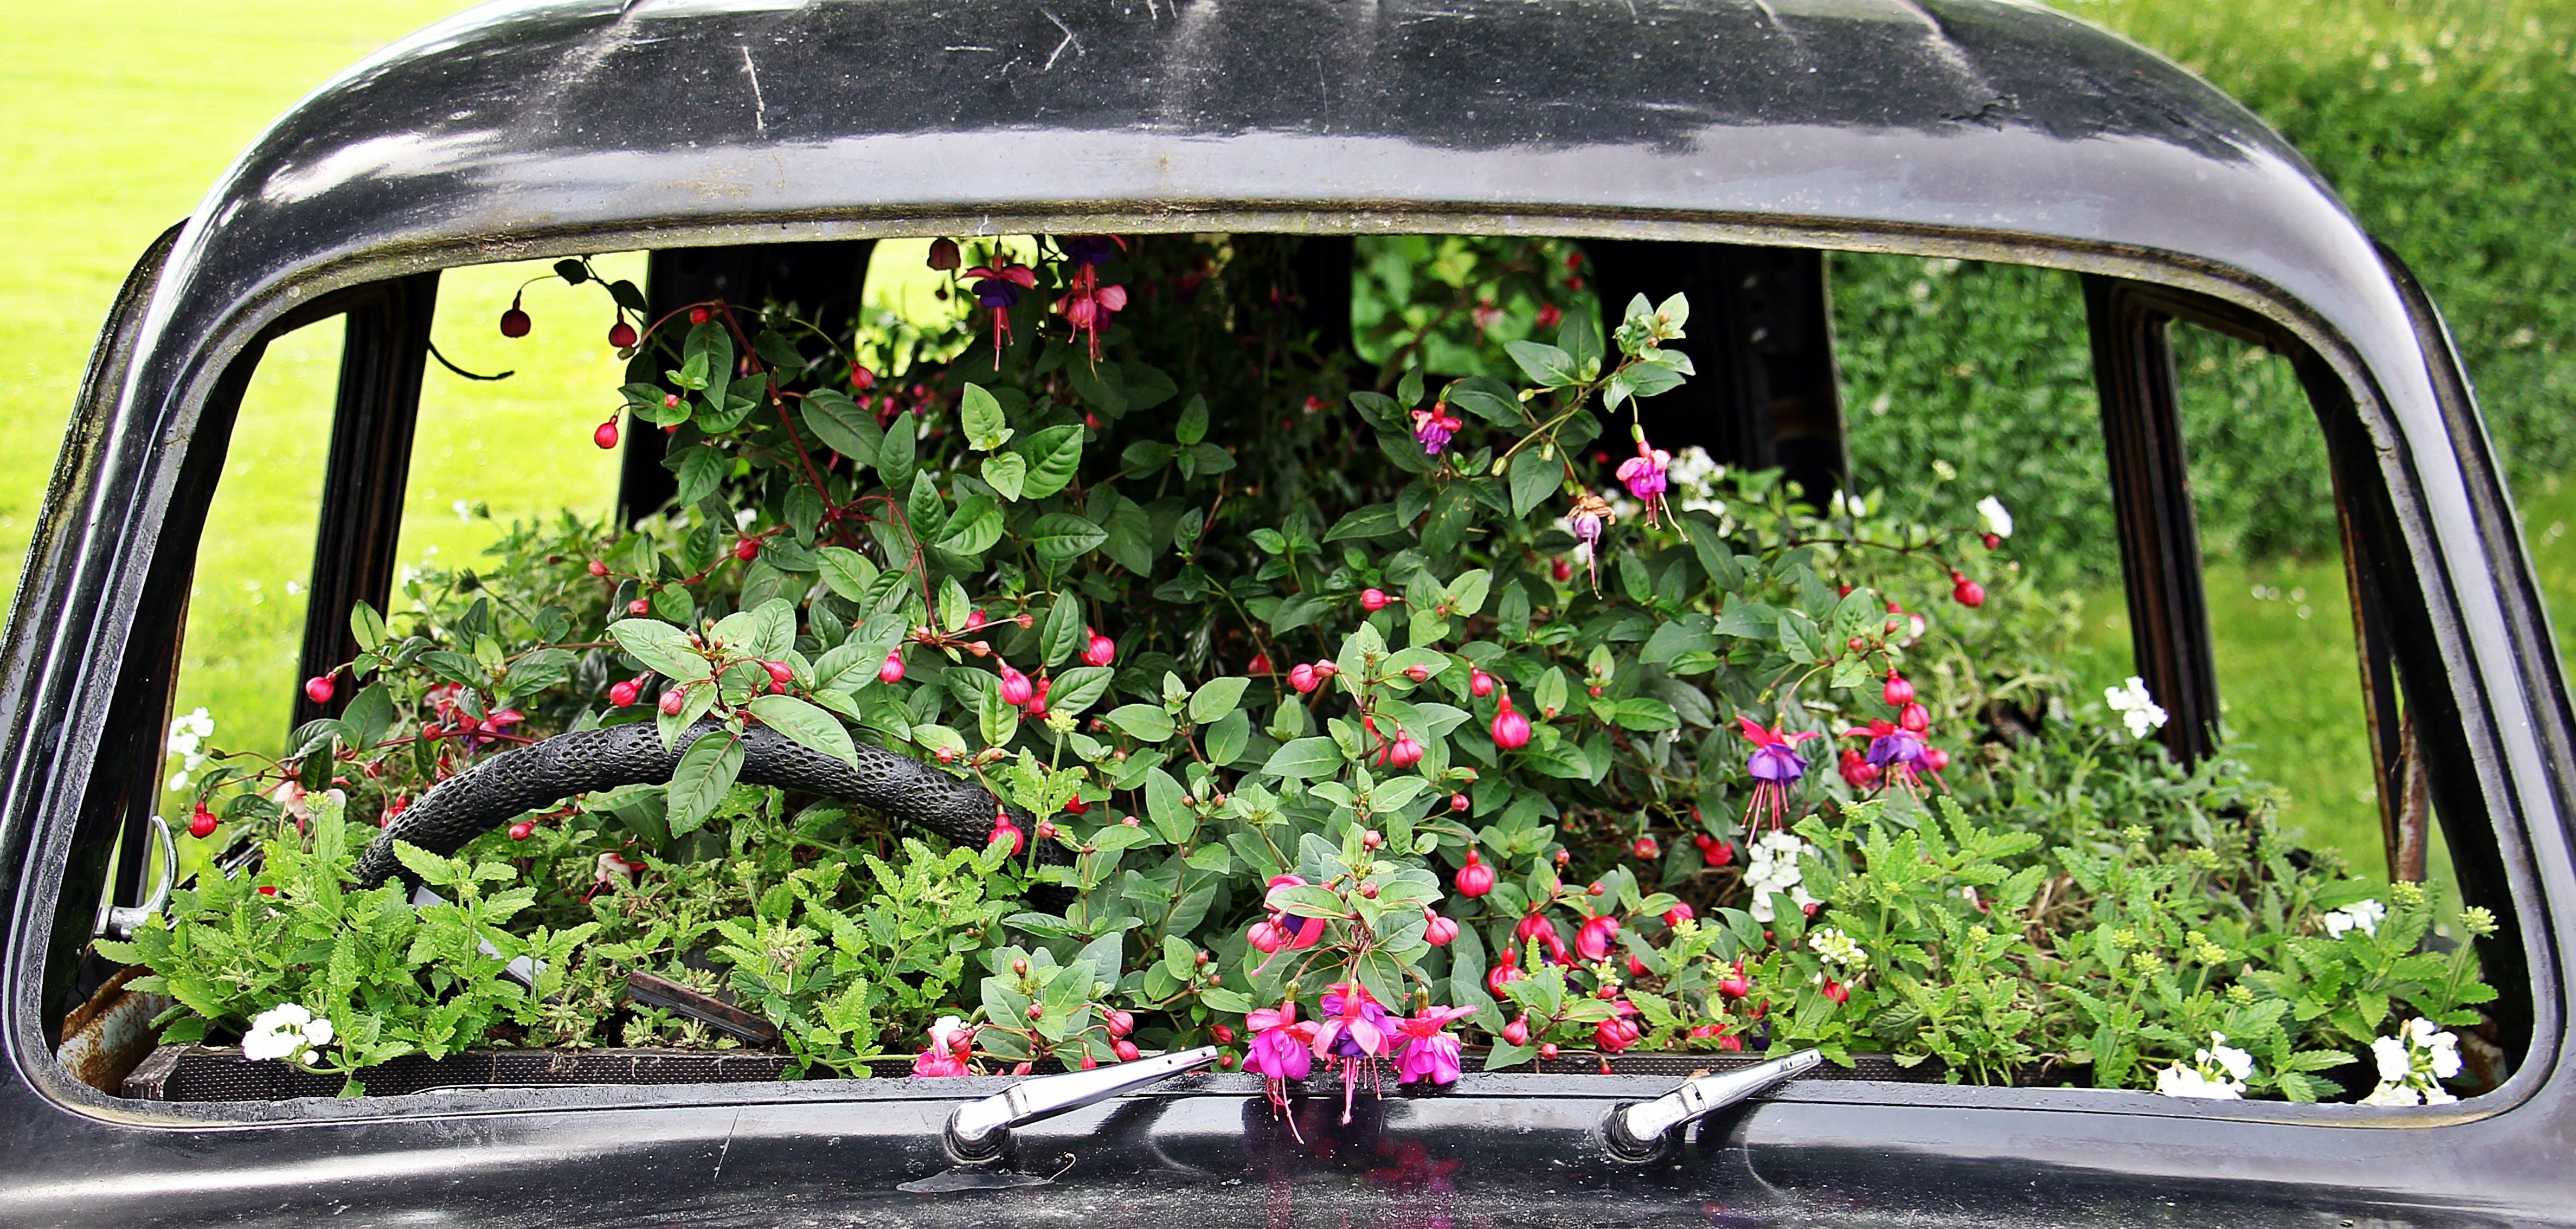 Free stock photo of flowers, auto, deco, planted